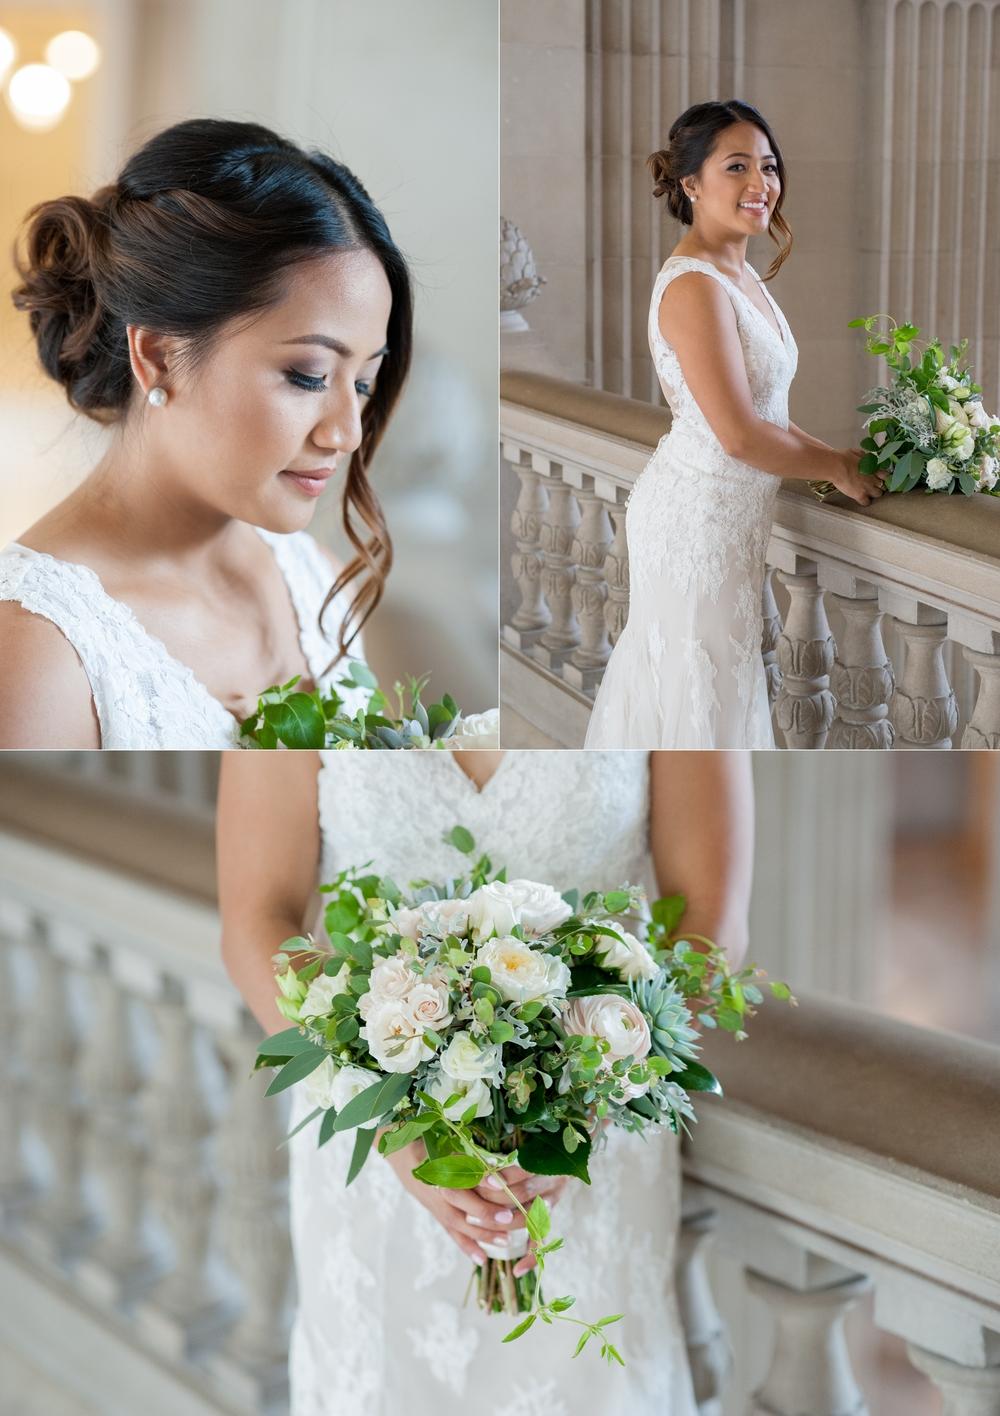 04-san-francisco-city-hall-sutro-baths-wedding-KJ-0200_WEB.jpg